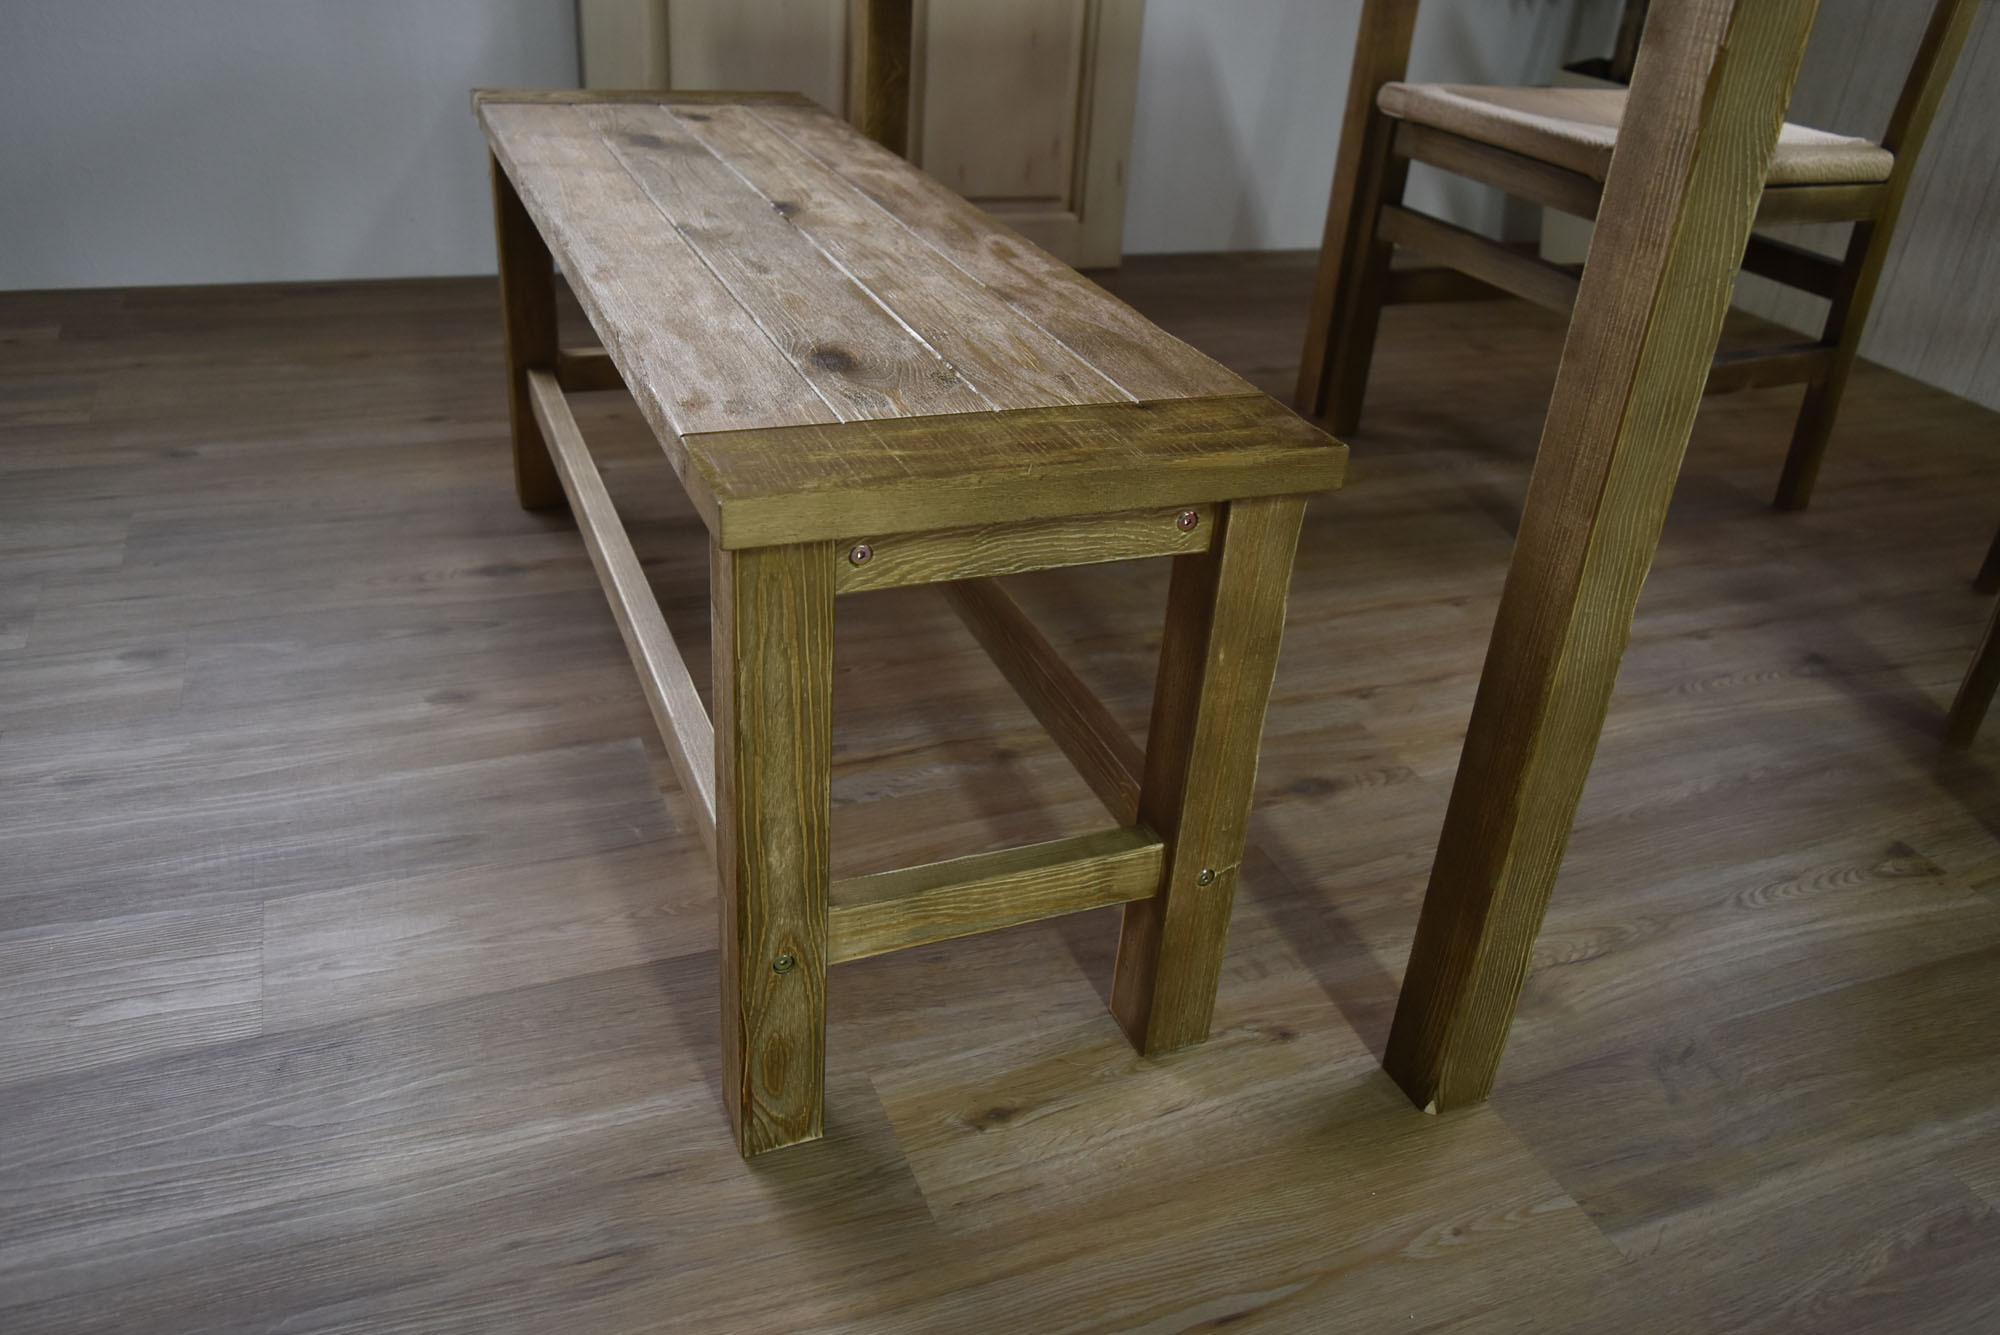 Old Pine Dining Bench Chair / アンティークカントリースタイル オールドパイン ダイニングベンチチェア